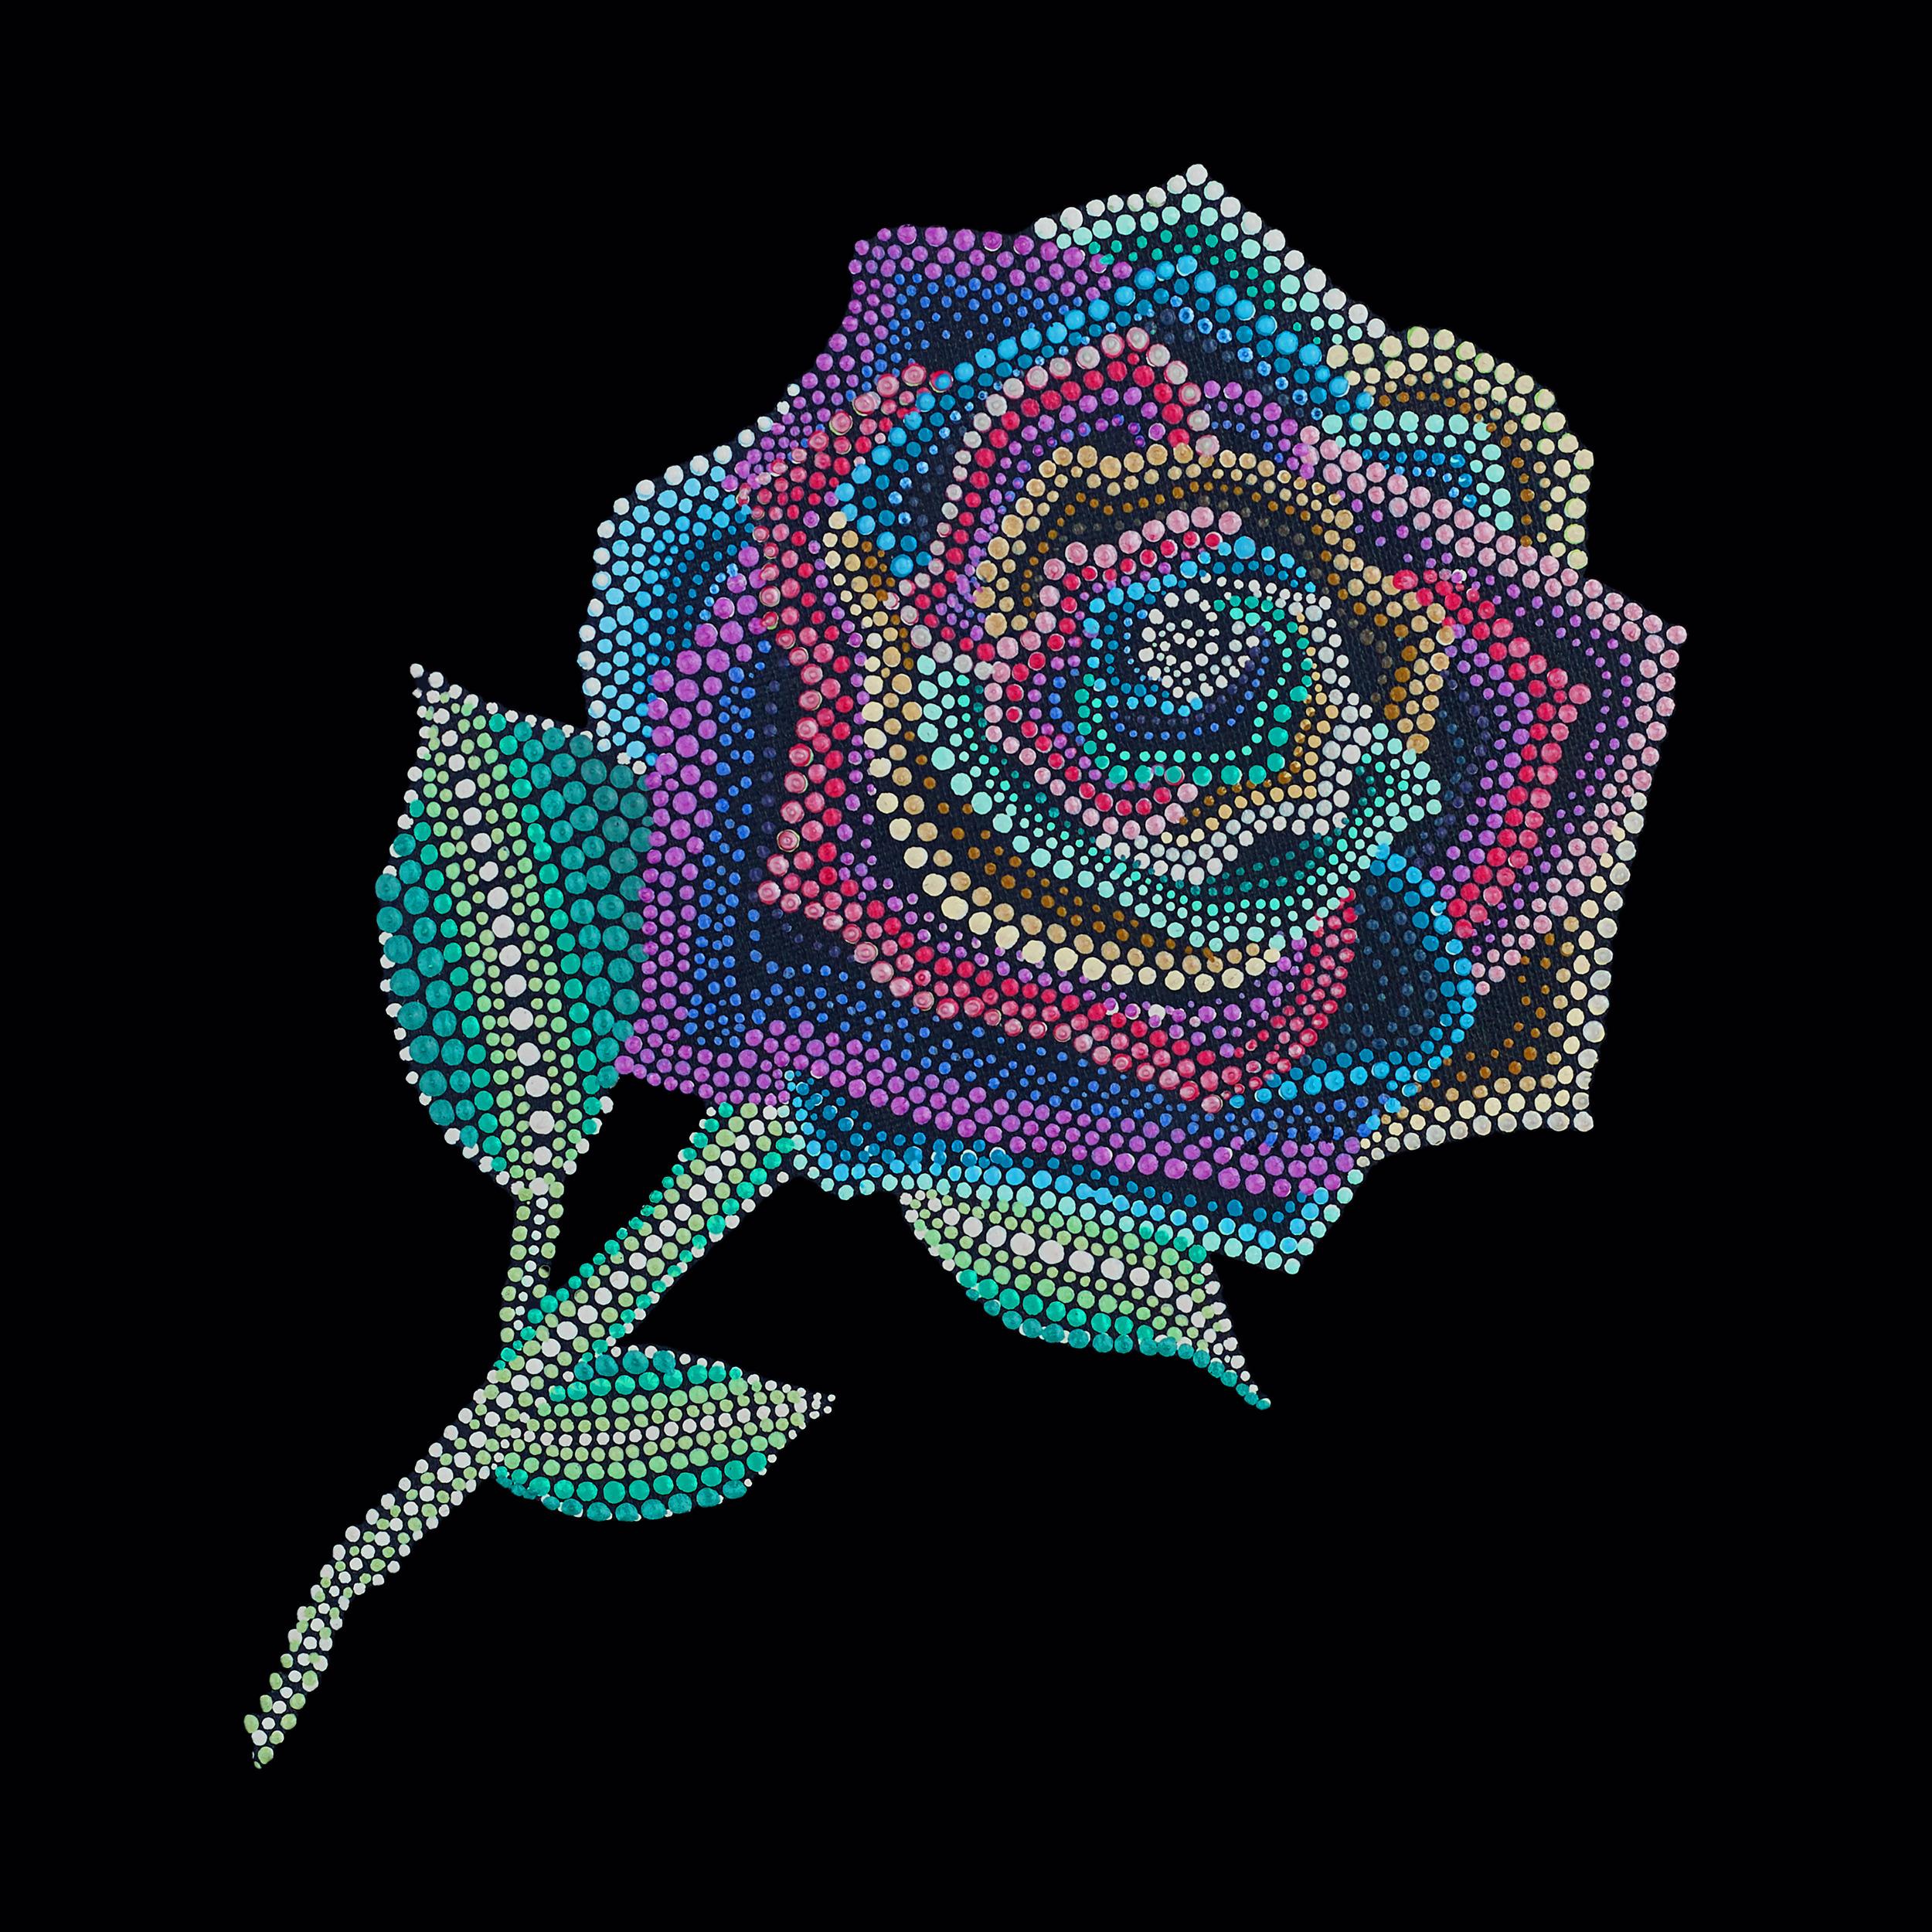 Rainbow rose painting copy kx7jwy